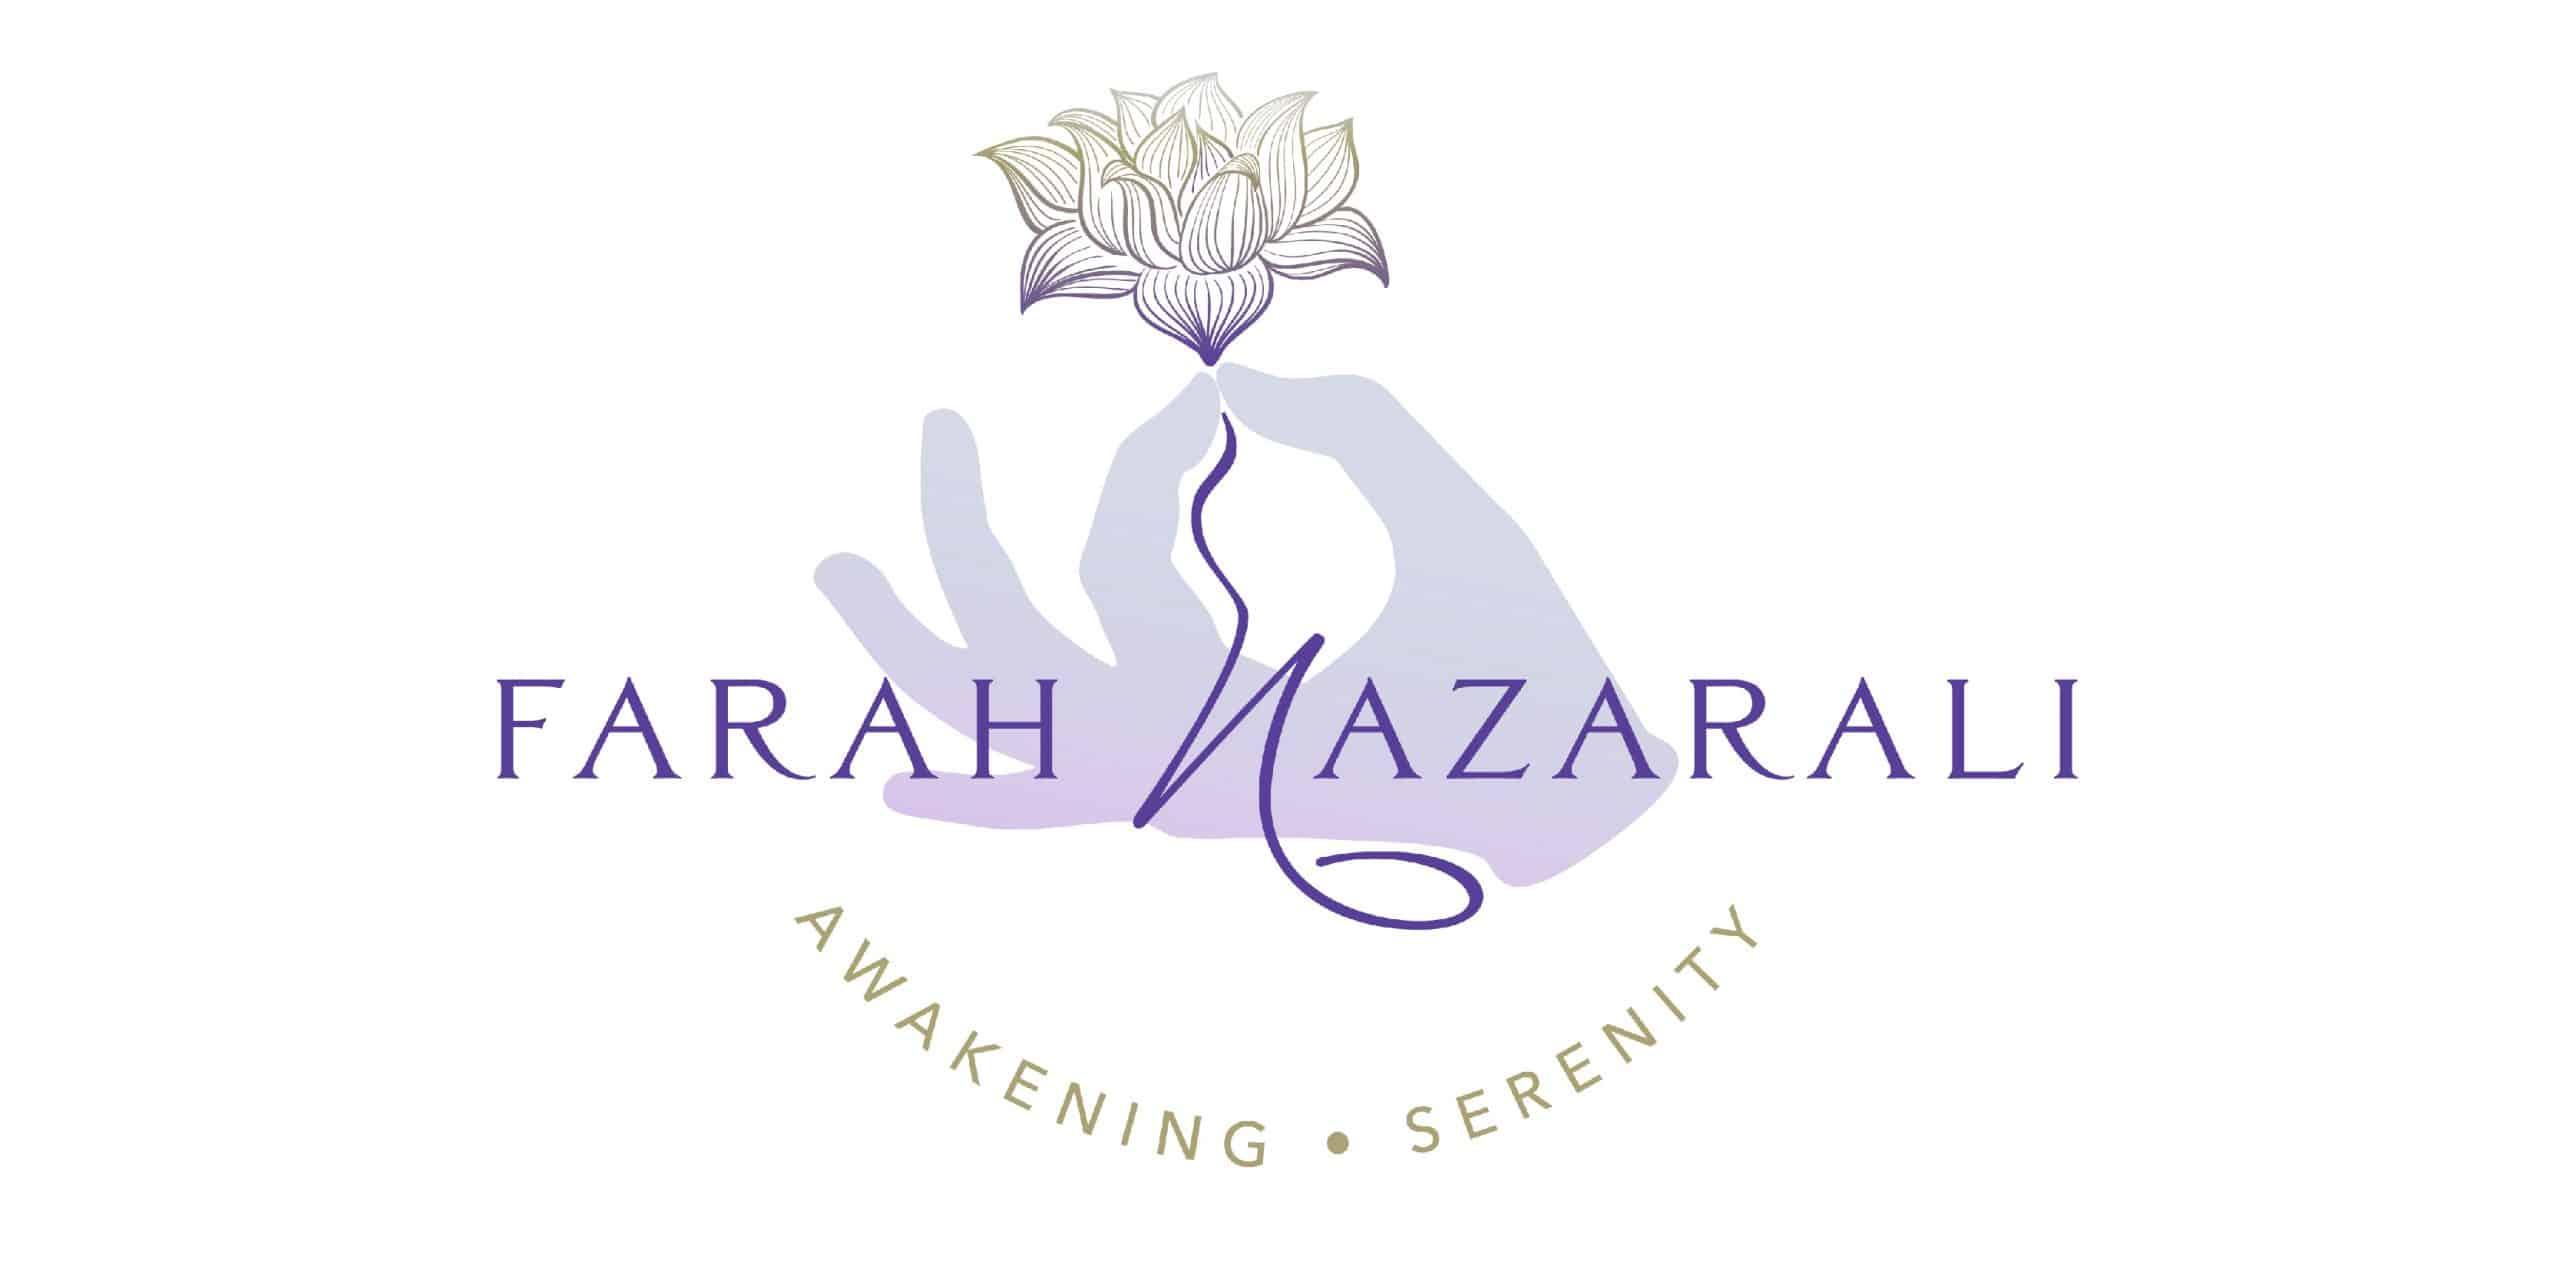 Farah Nazarali full logo - client project